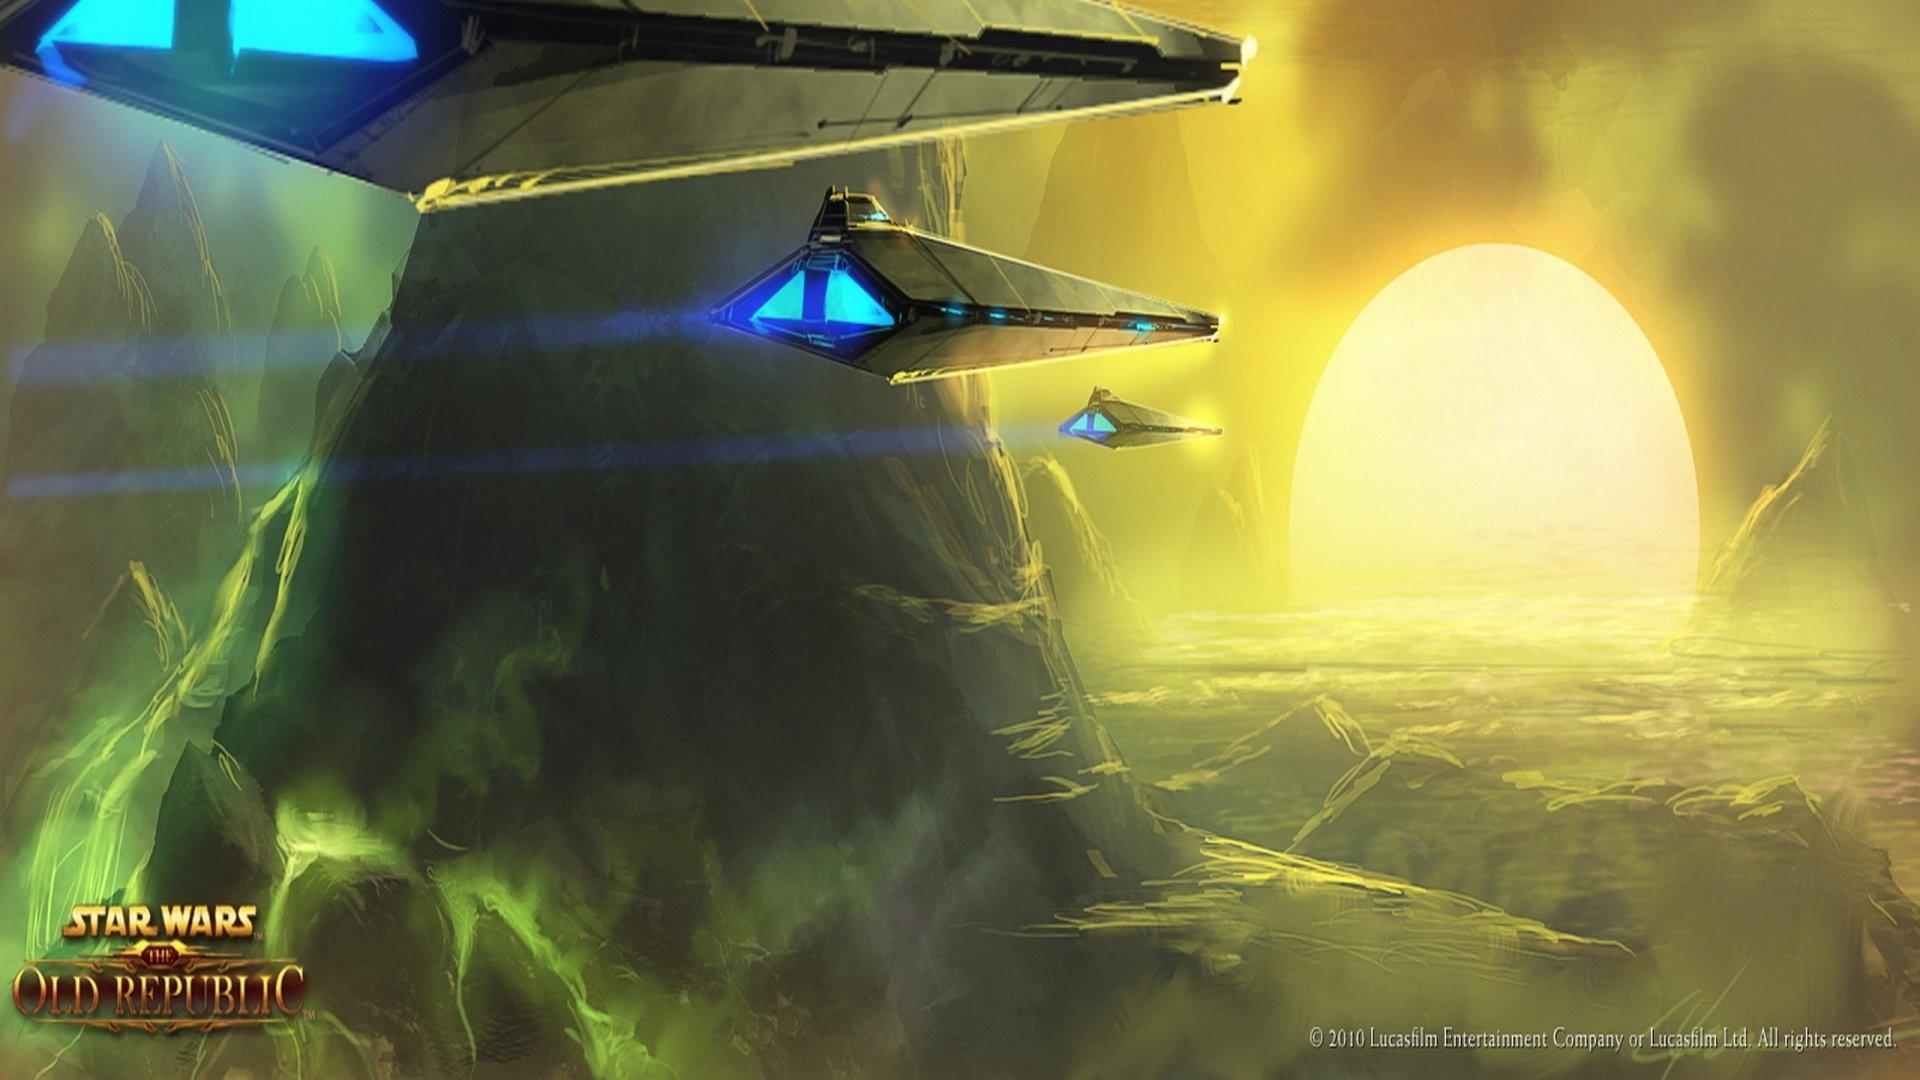 Star Wars The Old Republic Concept Art Wallpaper » WallDevil – Best free HD  desktop and